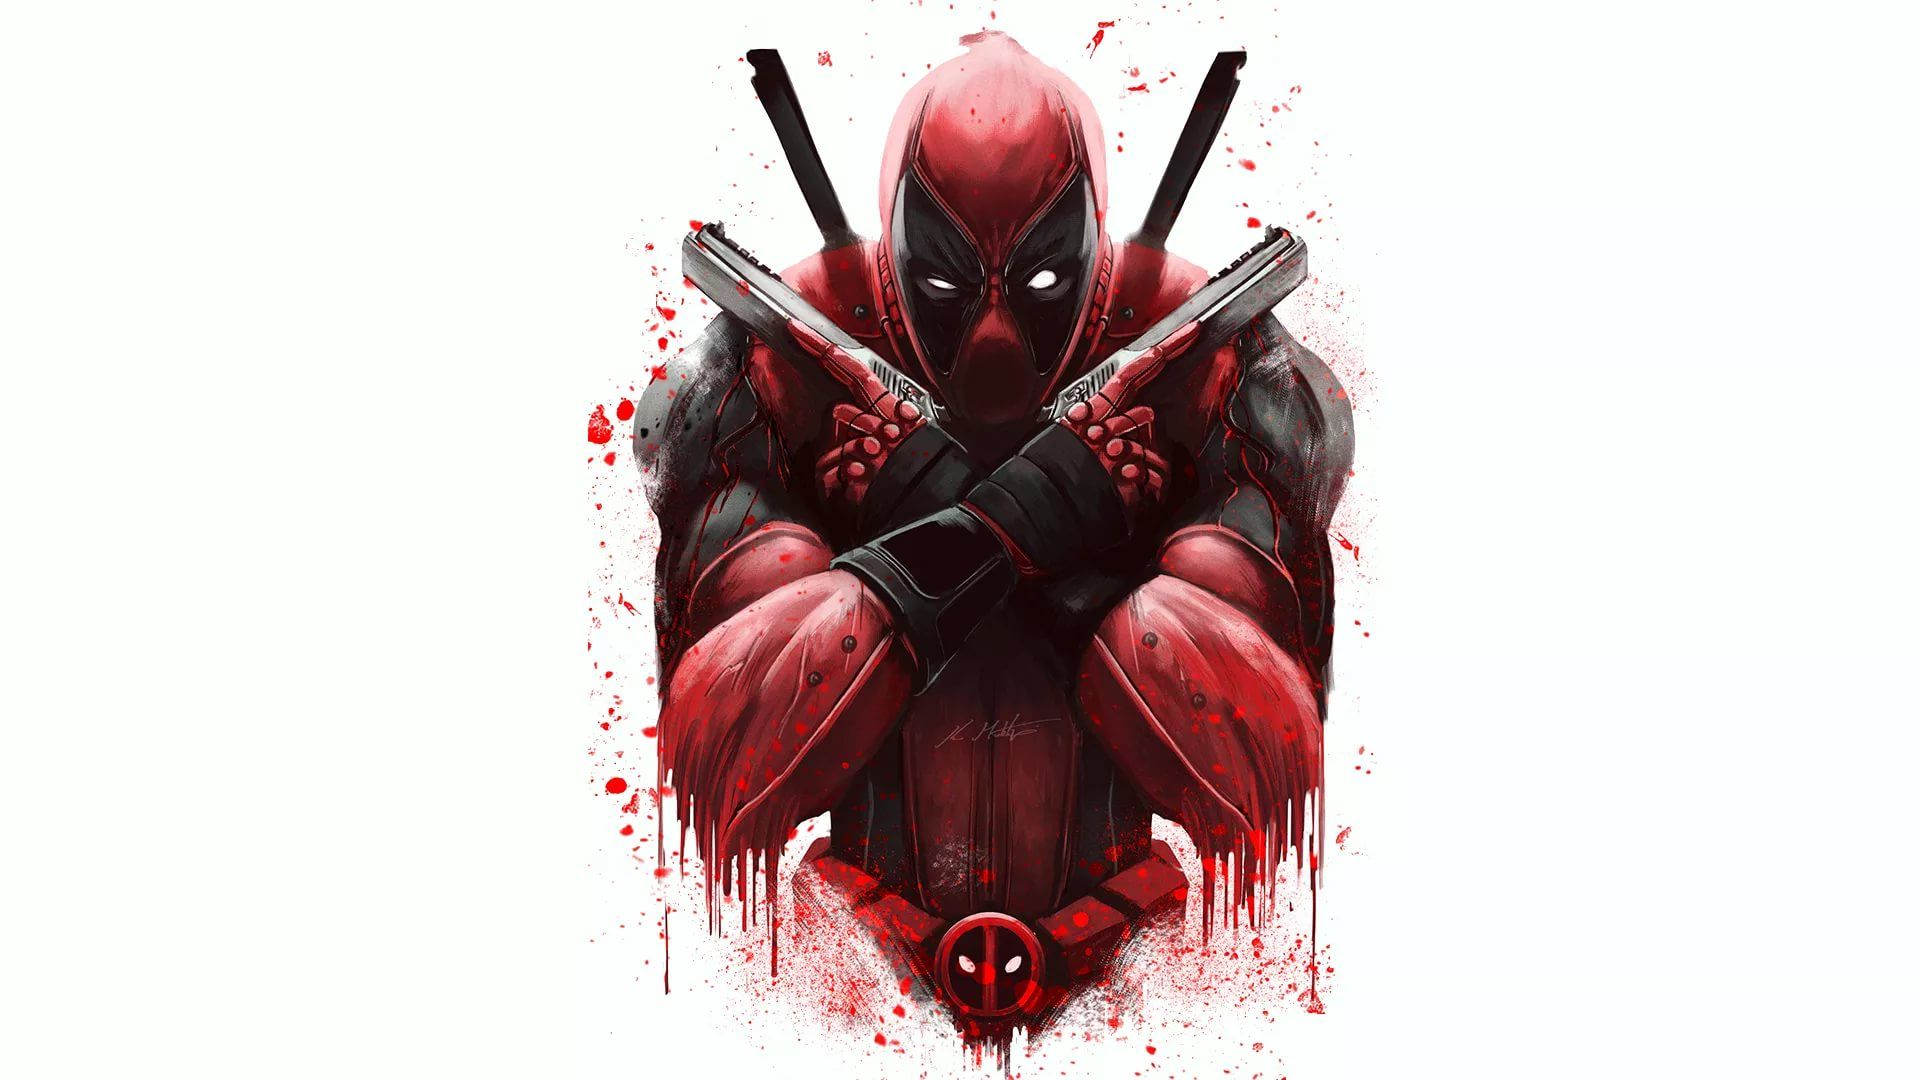 Cool Deadpool wallpaper download